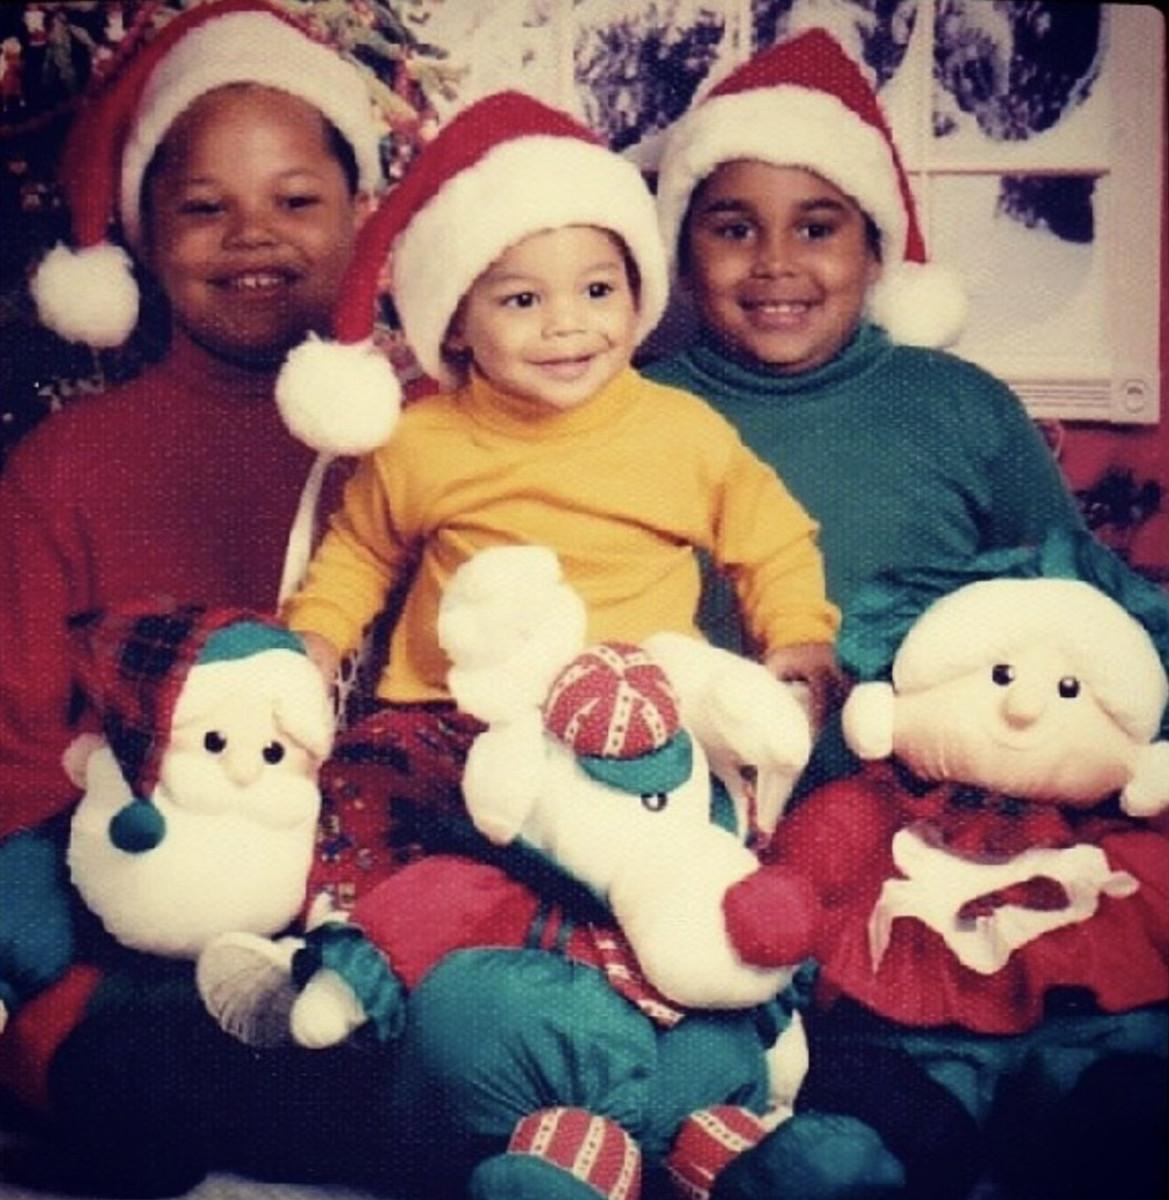 Jace, Dak and Tad Prescott as kids